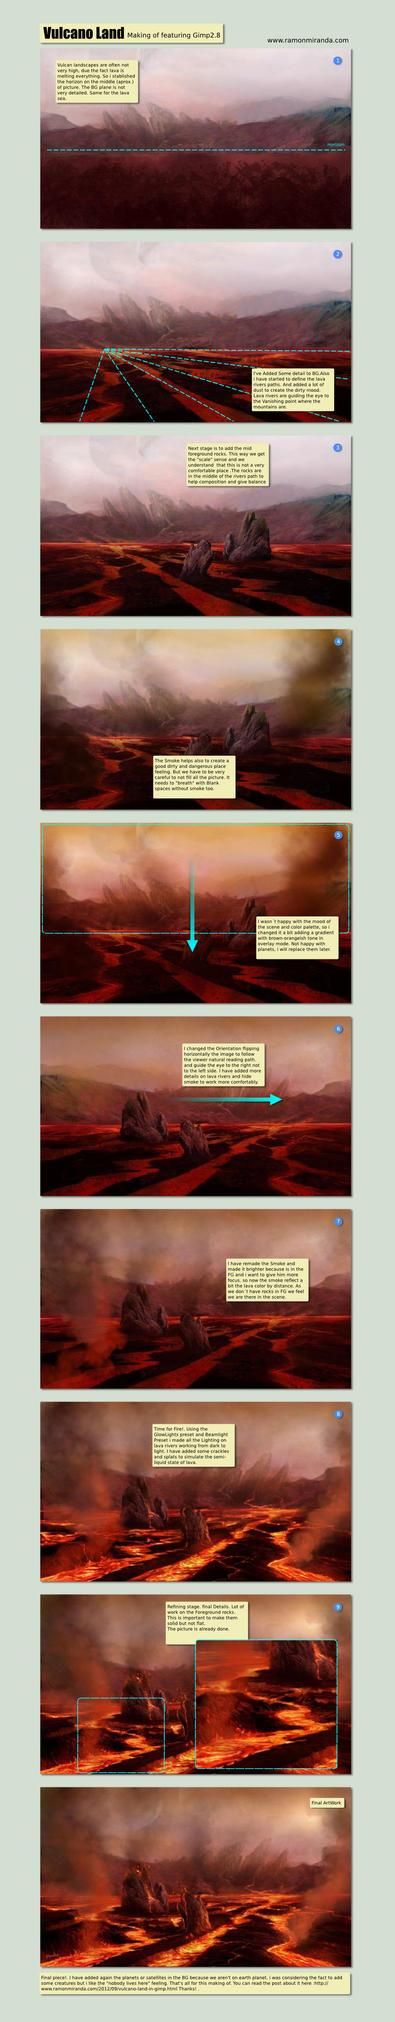 Vulcano Land Making of by TheShock